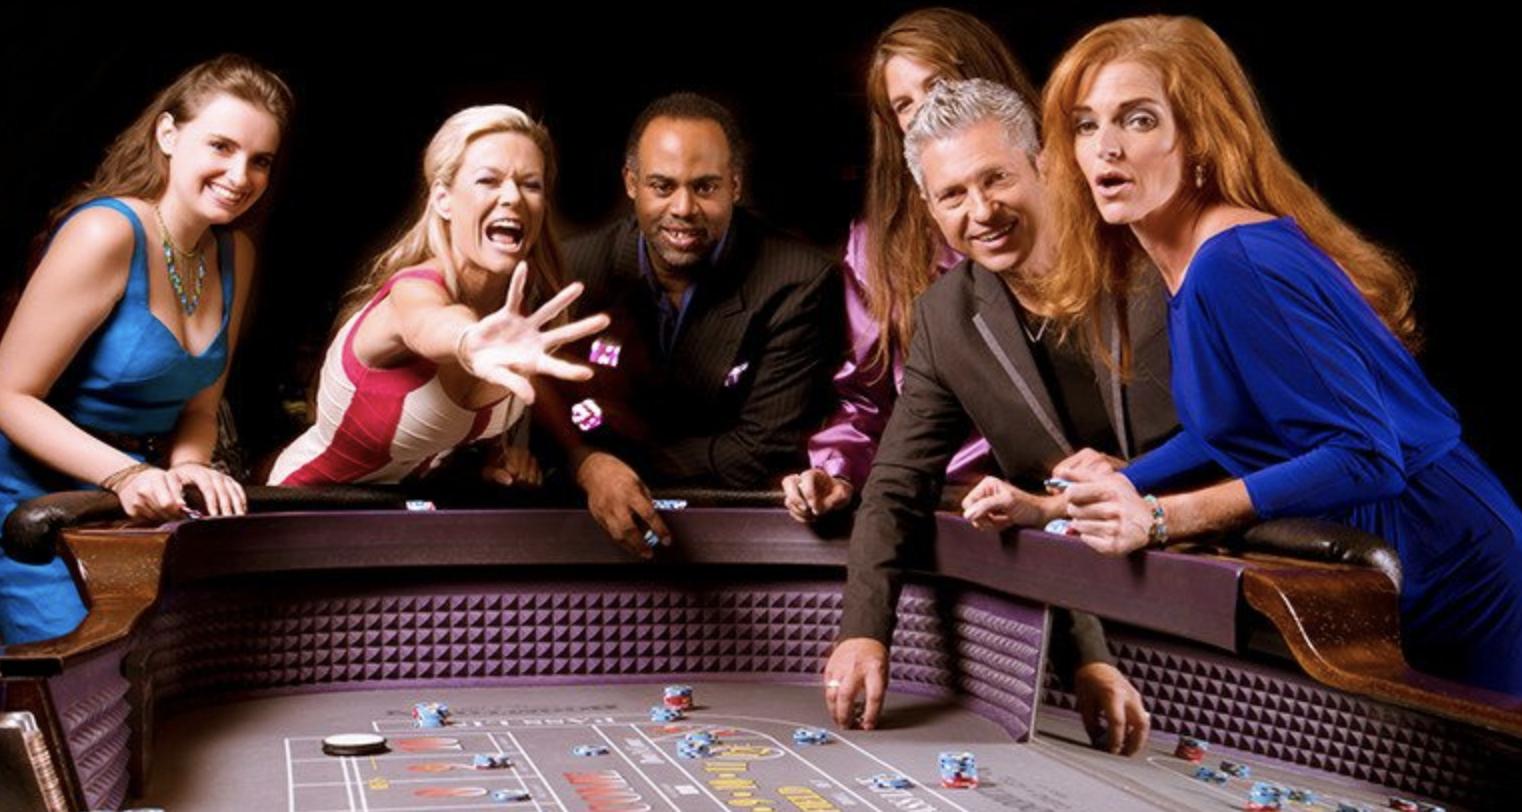 How to use best casino bonus in 2019 - New Online Sites UK